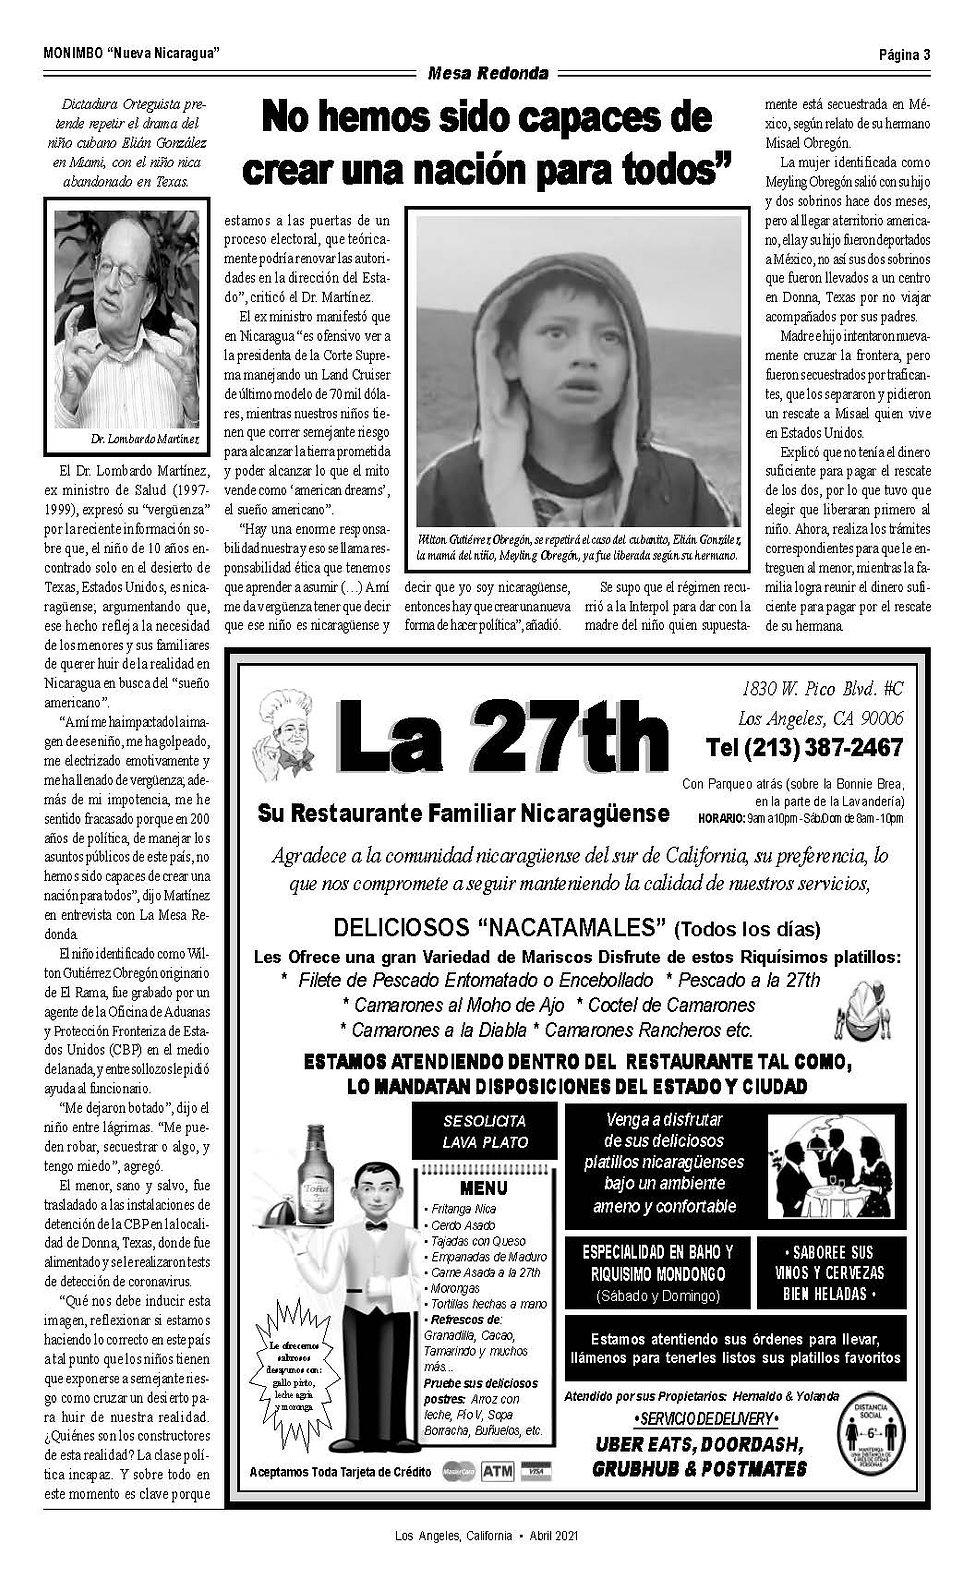 MONIMBO - 04-2021 - PG3.jpg